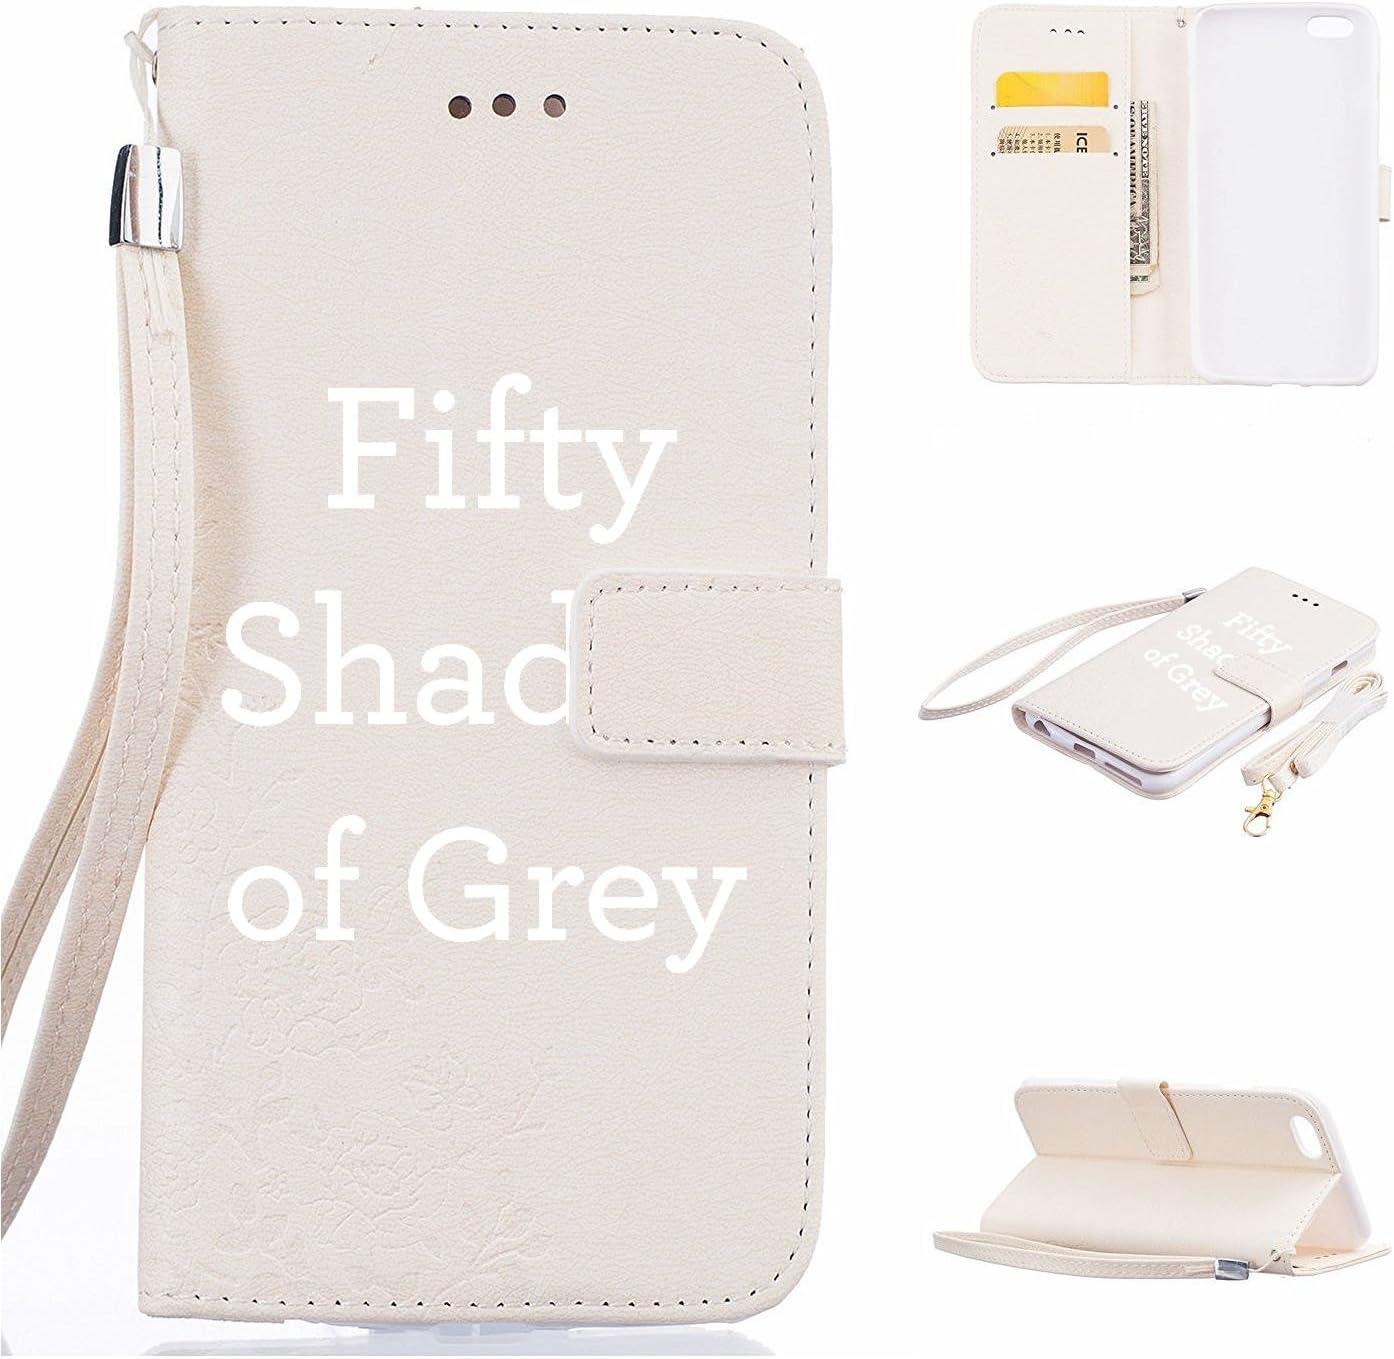 Smartphone Accessory,Exclusive Samsung Note 3 Cover Fifty Shades Of Grey Anime Girly Funda Para Samsung Galaxy Note 3 N9005: Amazon.es: Electrónica